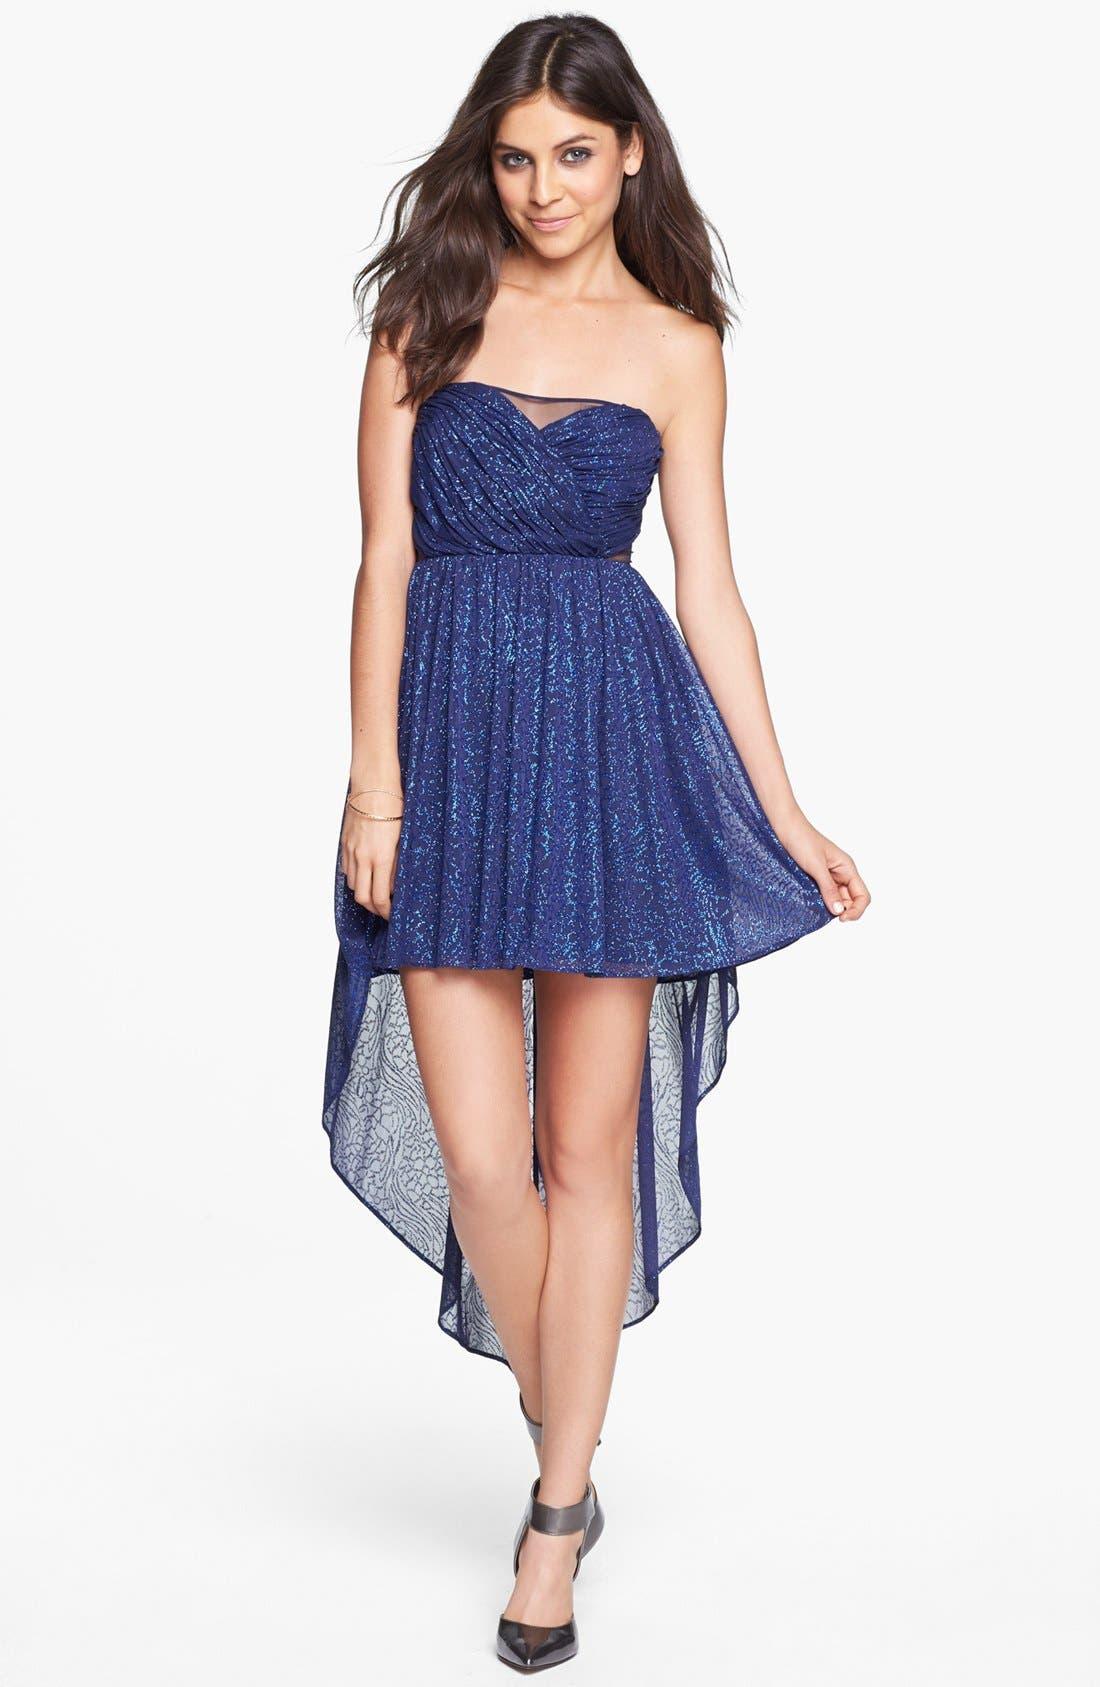 Alternate Image 1 Selected - Hailey Logan Mesh Inset Glitter High/Low Dress (Juniors)